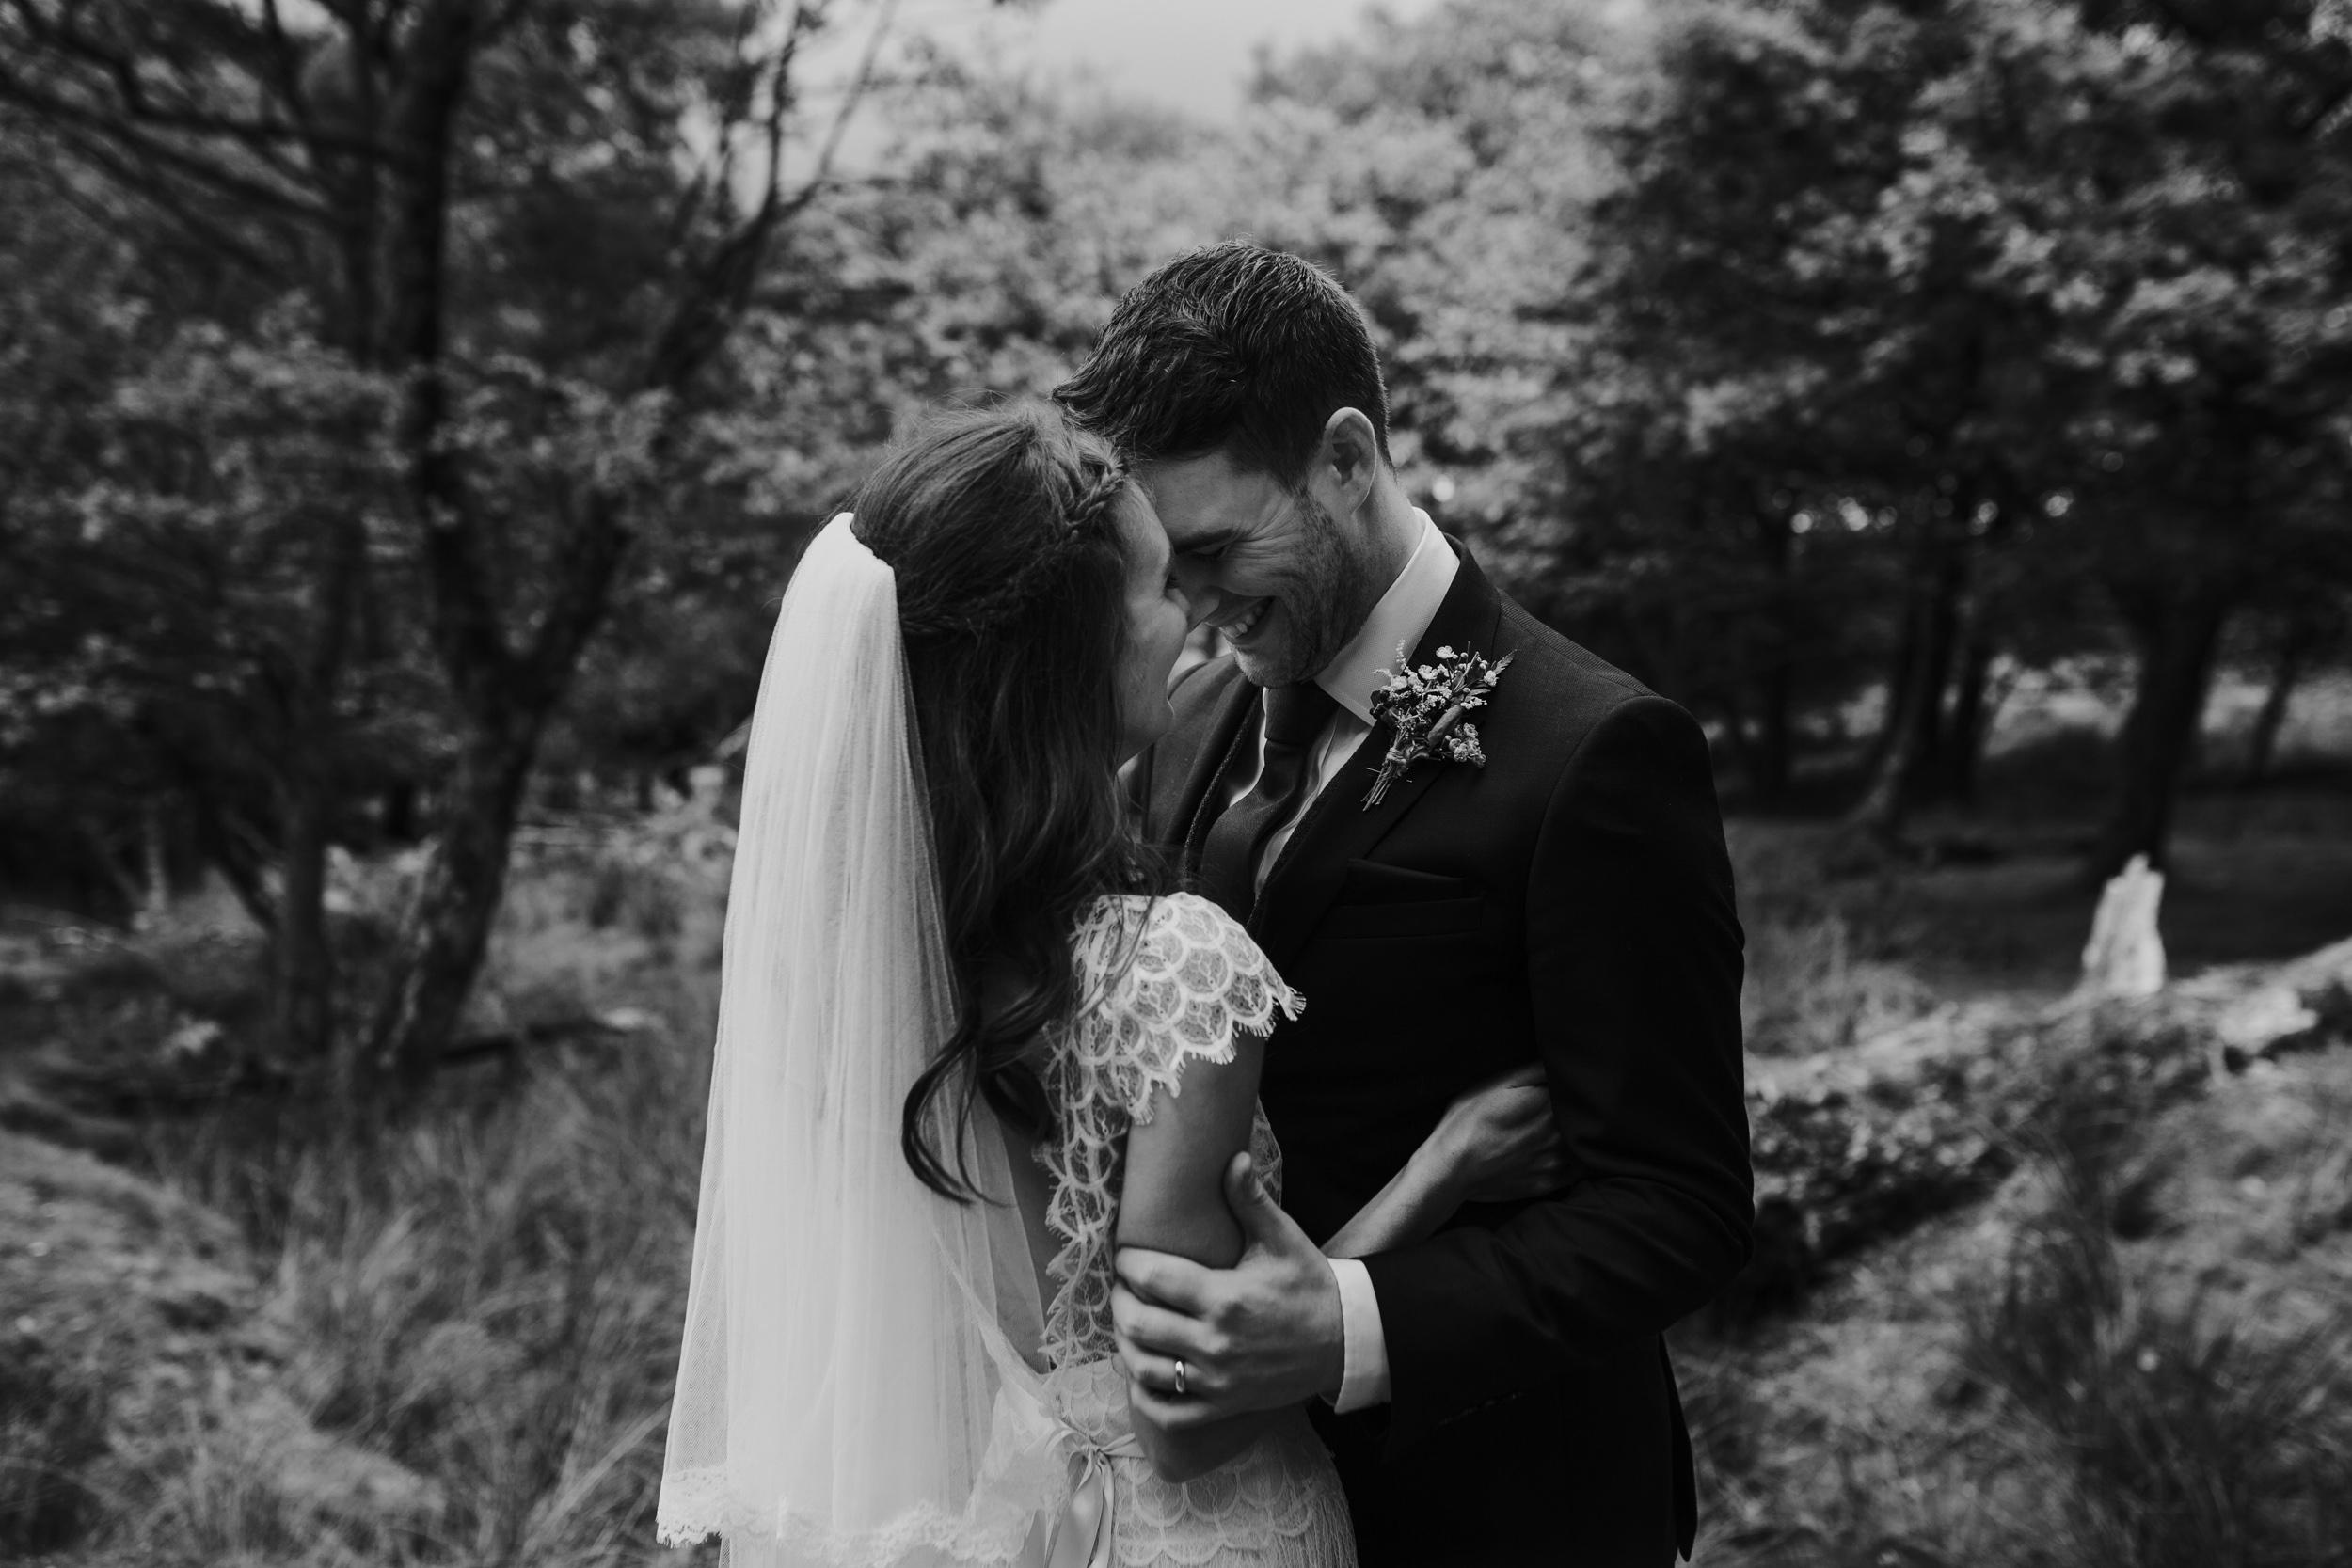 Joasia-Kate-Beaumont-Bohemian-Lace-Wedding-Dress-Peak-District-Sheffield-Wedding-31.jpg